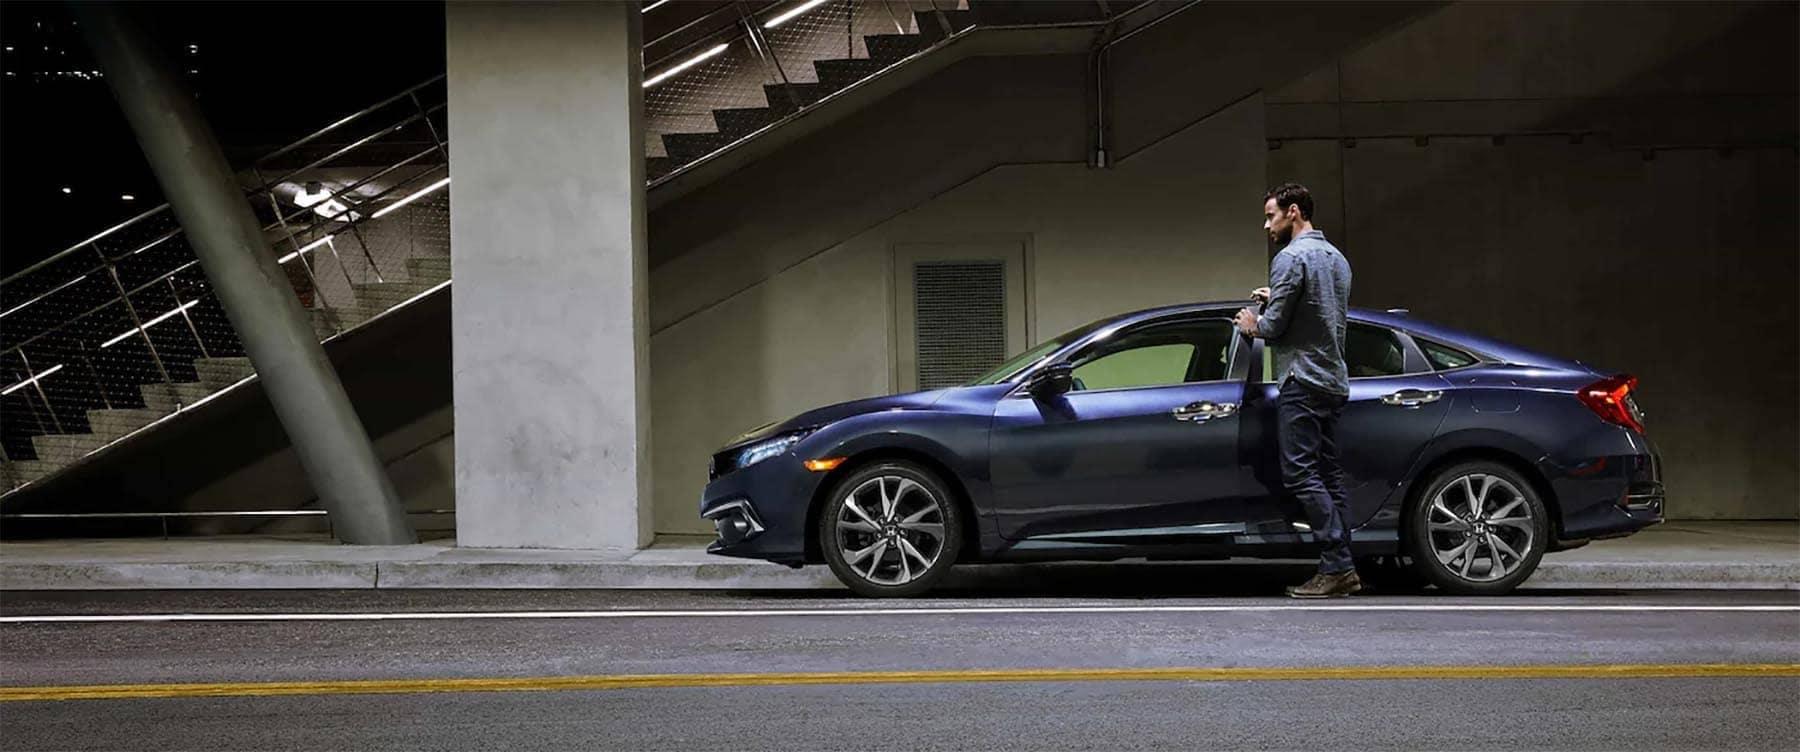 Man entering 2019 Honda Civic Sedan Parked on Side of Road